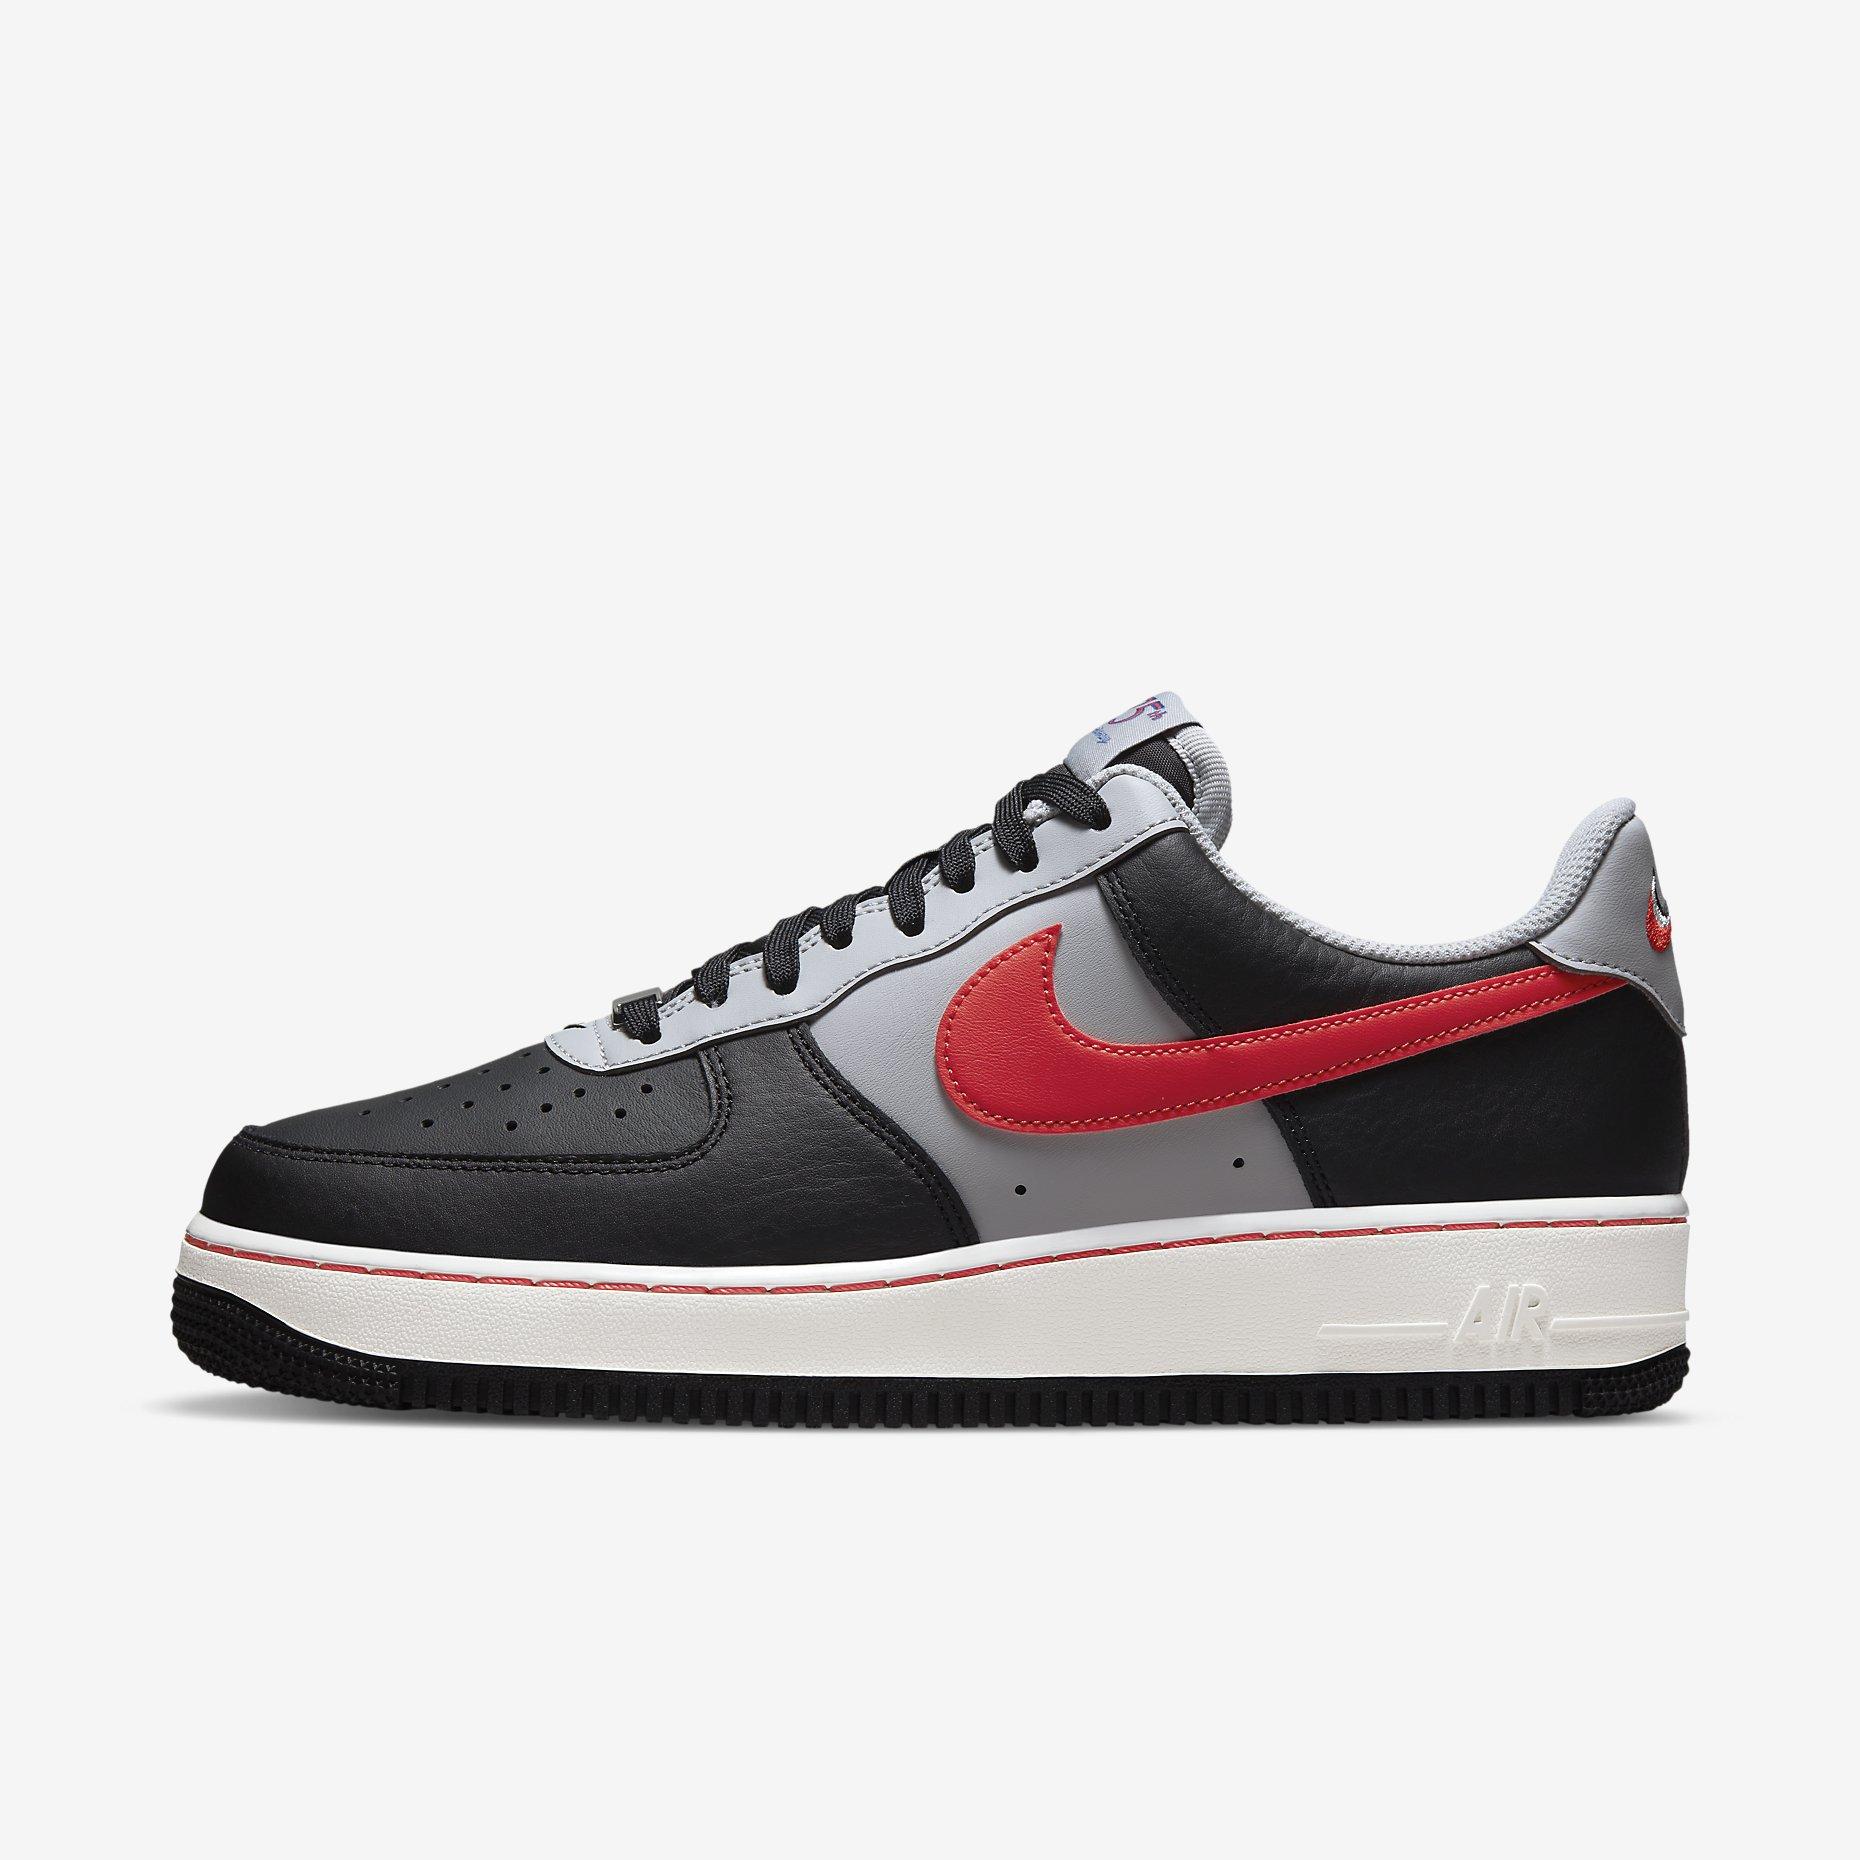 NBA x Nike Air Force 1 '07 LV8 'Black/Grey Fog/Chile Red'